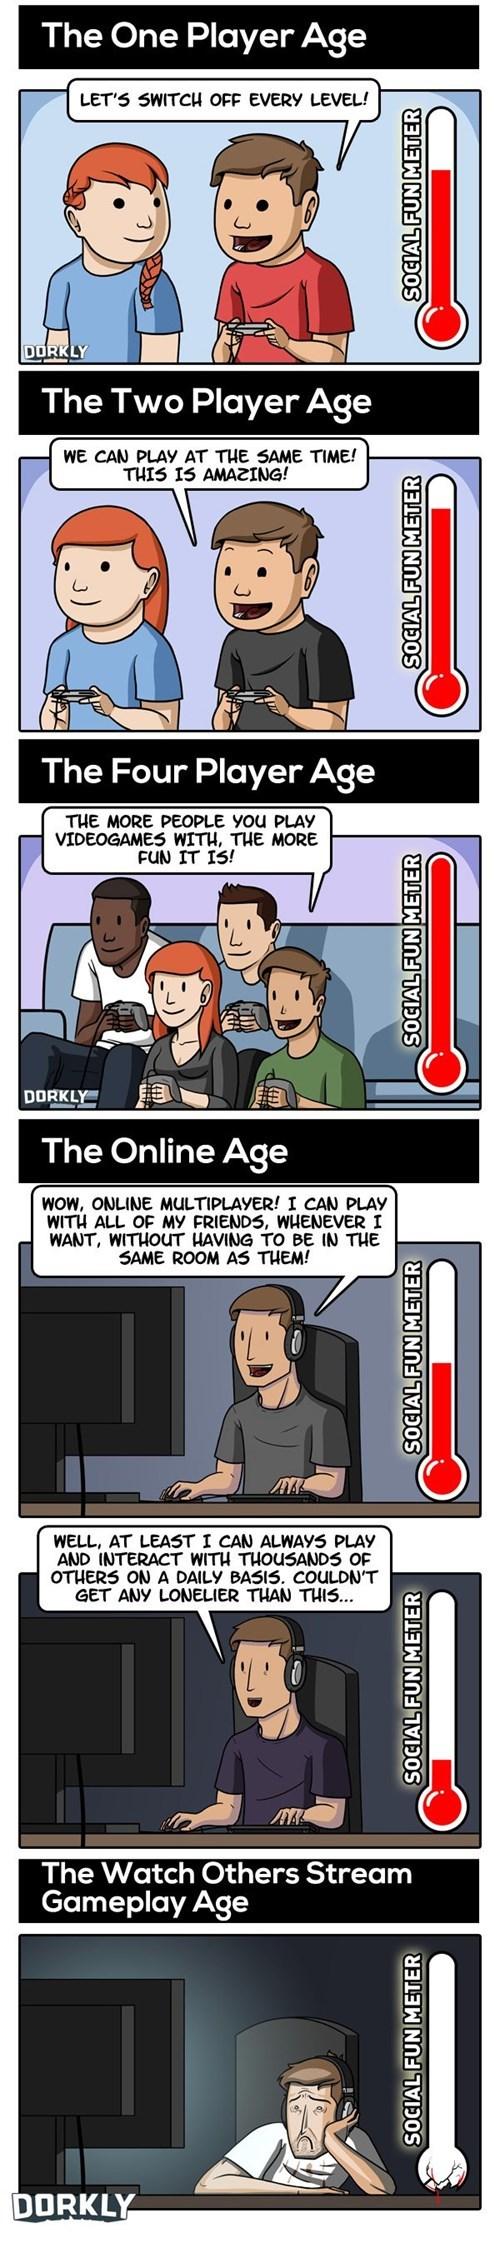 dorkly Multiplayer web comics